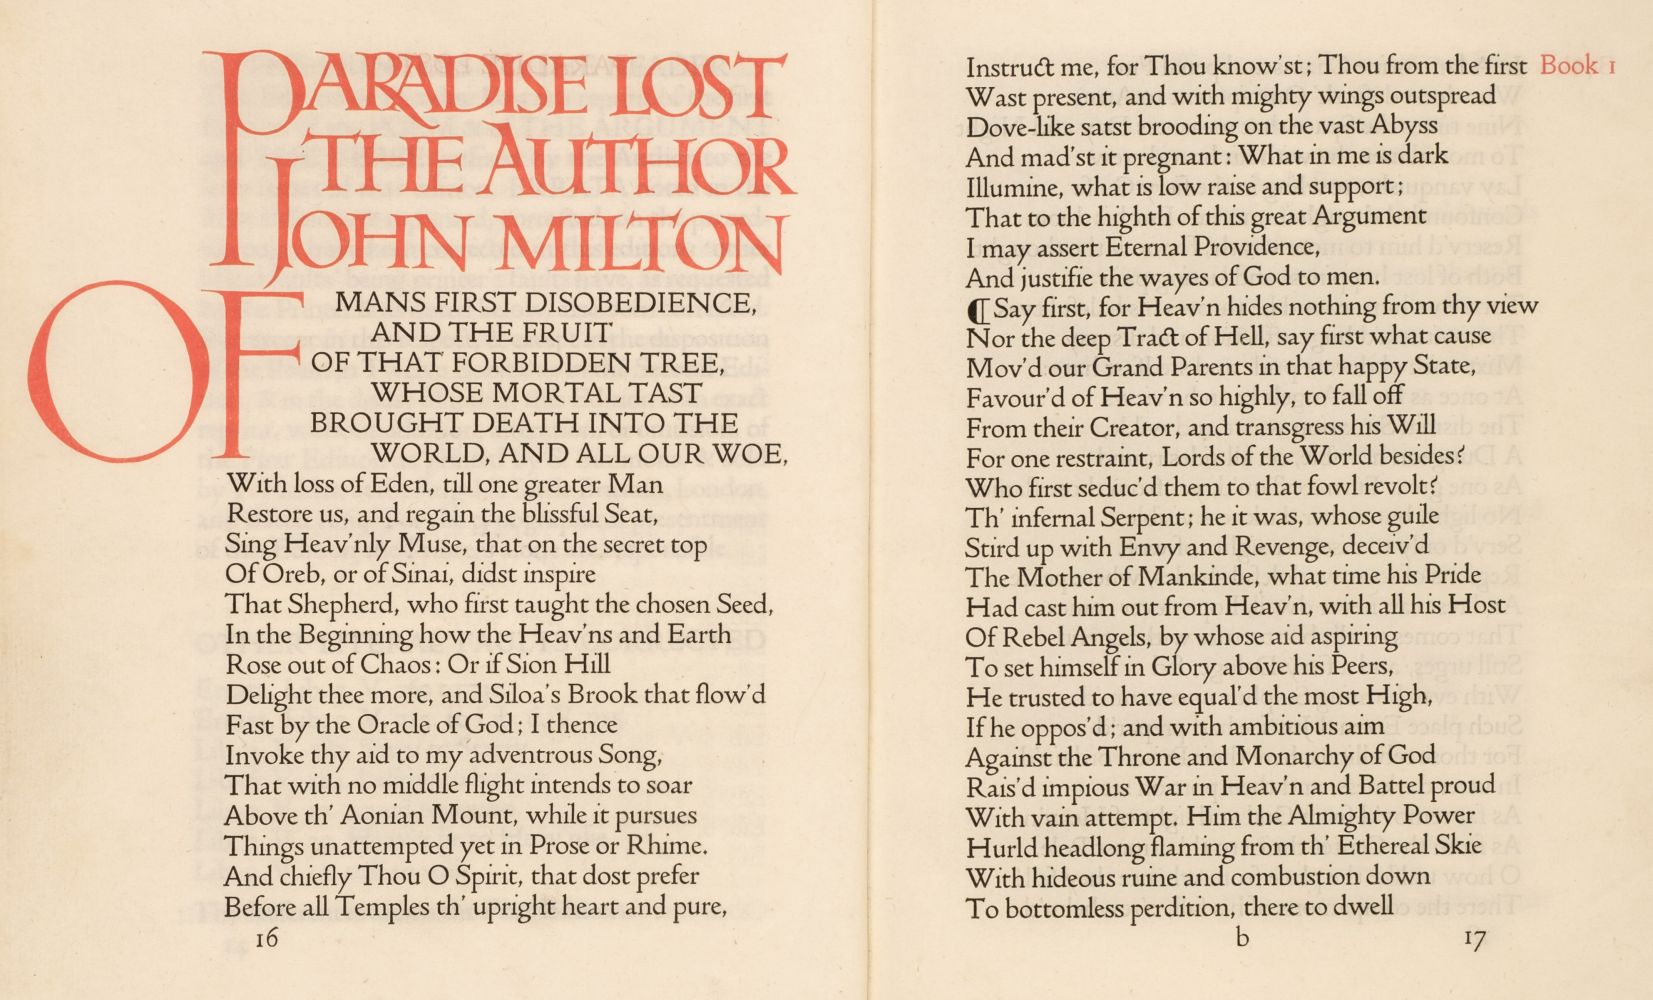 Doves Press. Paradise Lost, 1902